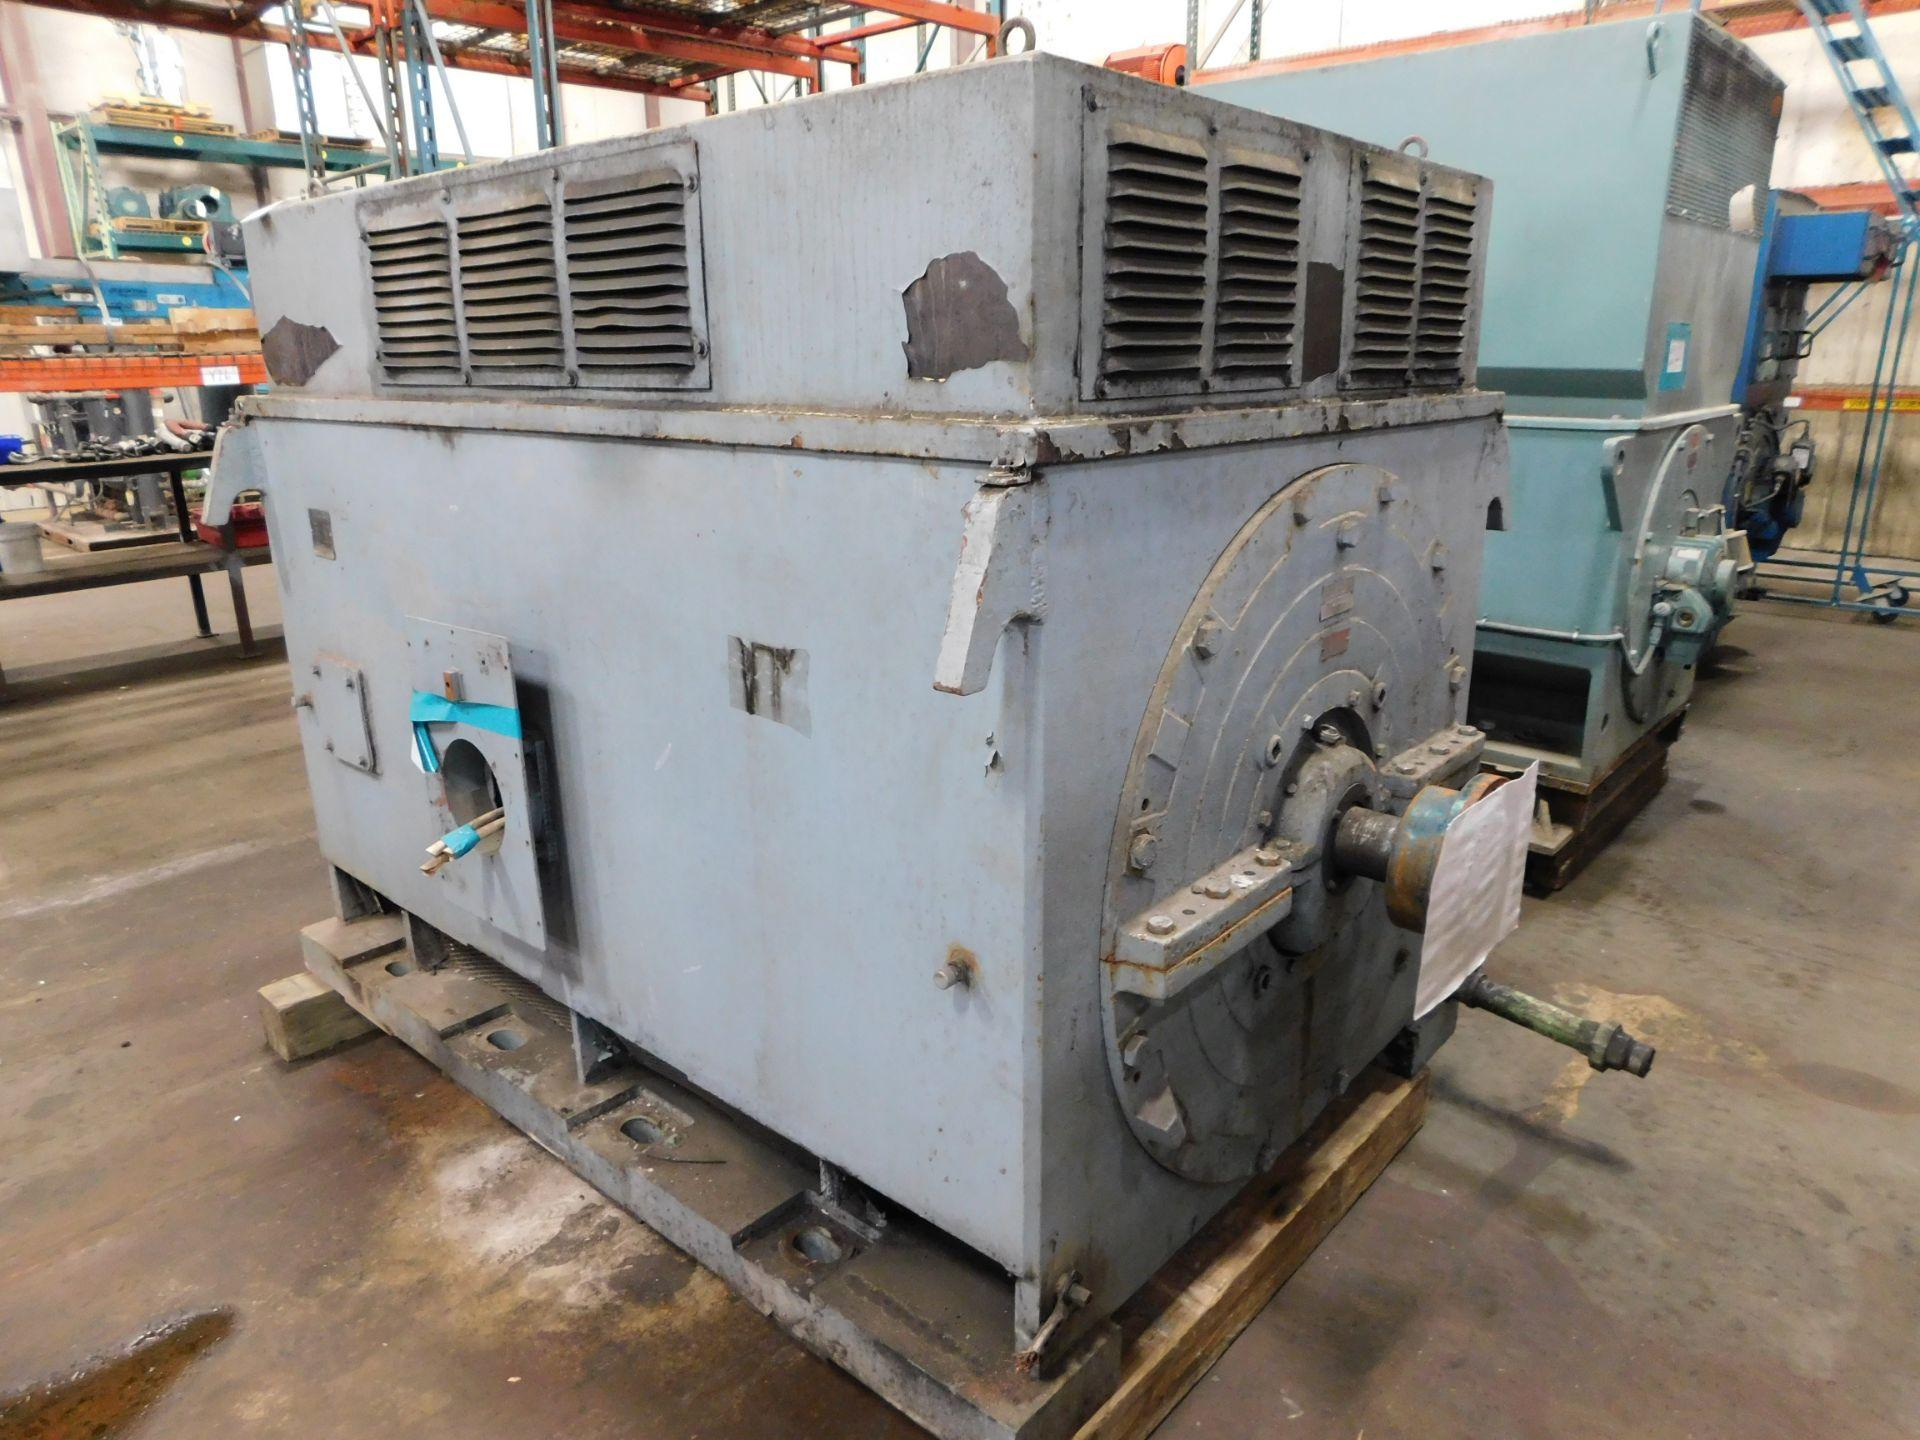 Louis Allis IPS Induction Motor. 2500 HP. 3 Ph. 4000 V. 3590 RPM. WP-1. 1000 SPC. - Image 2 of 5